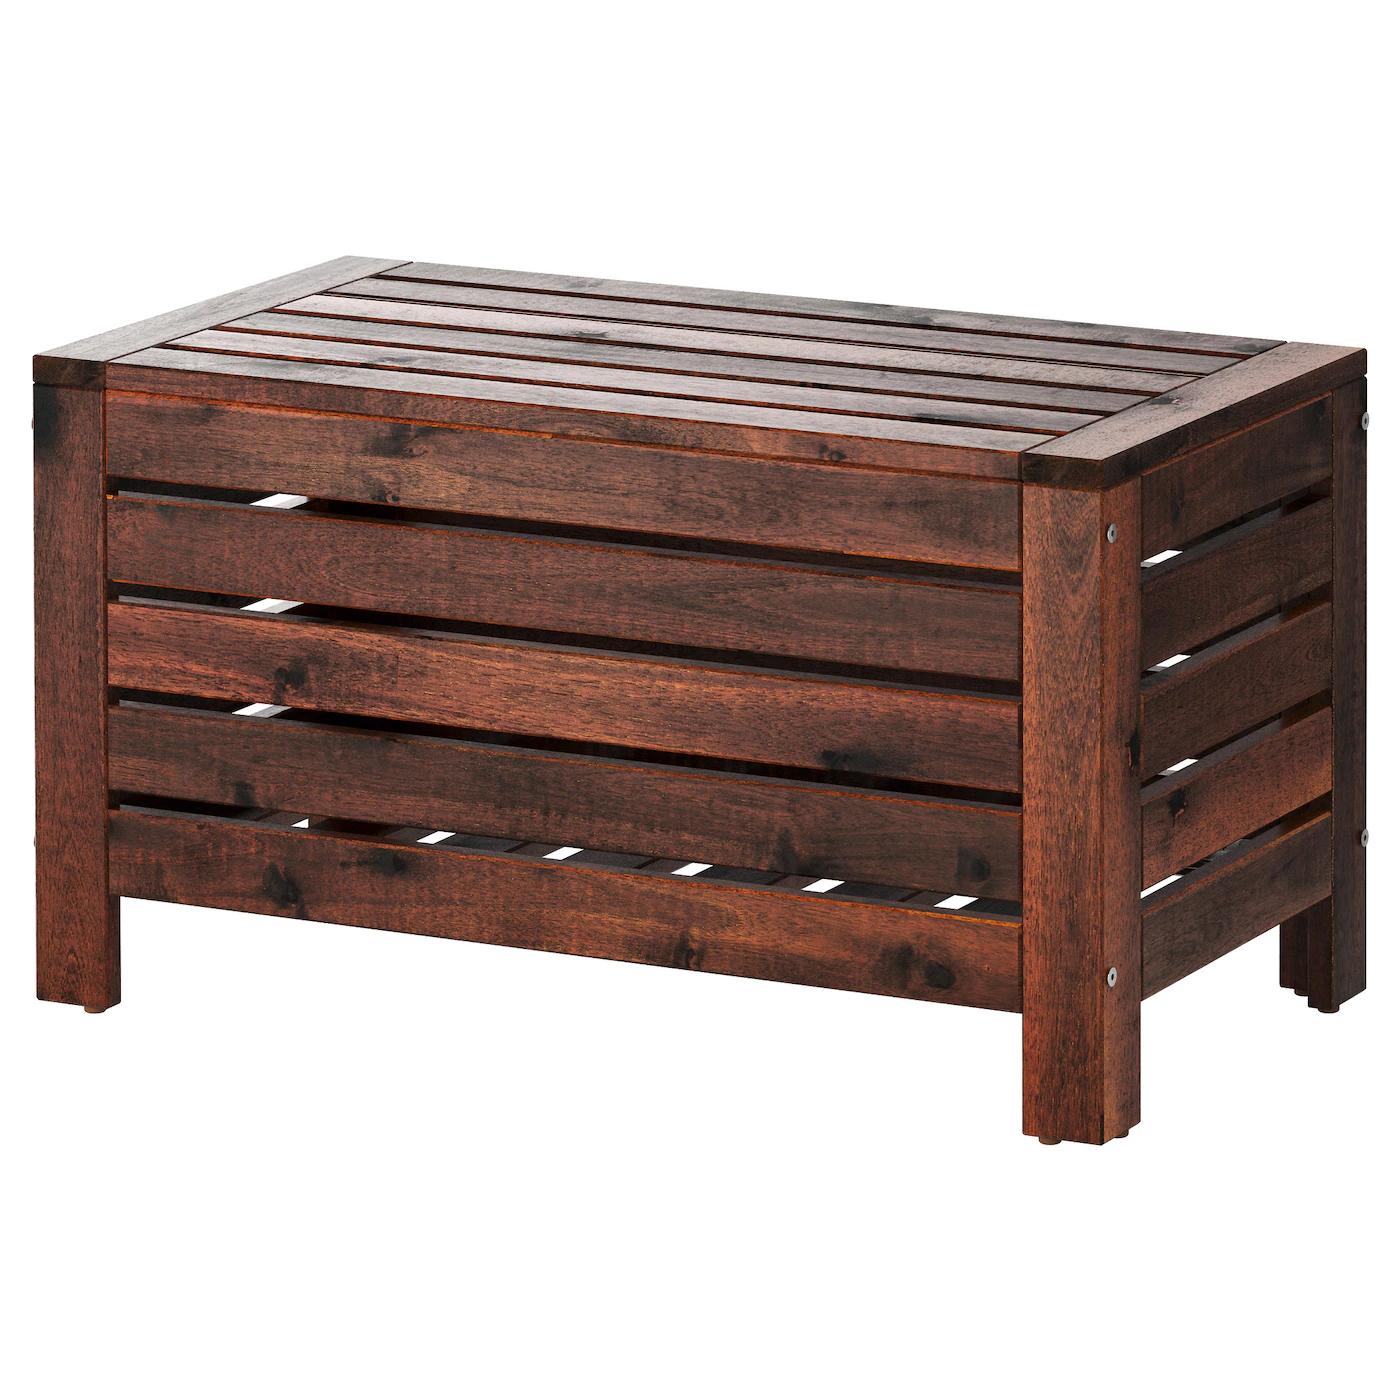 [Ikea Family] Banc de rangement Äpplarö - Teinté brun, 80x41cm